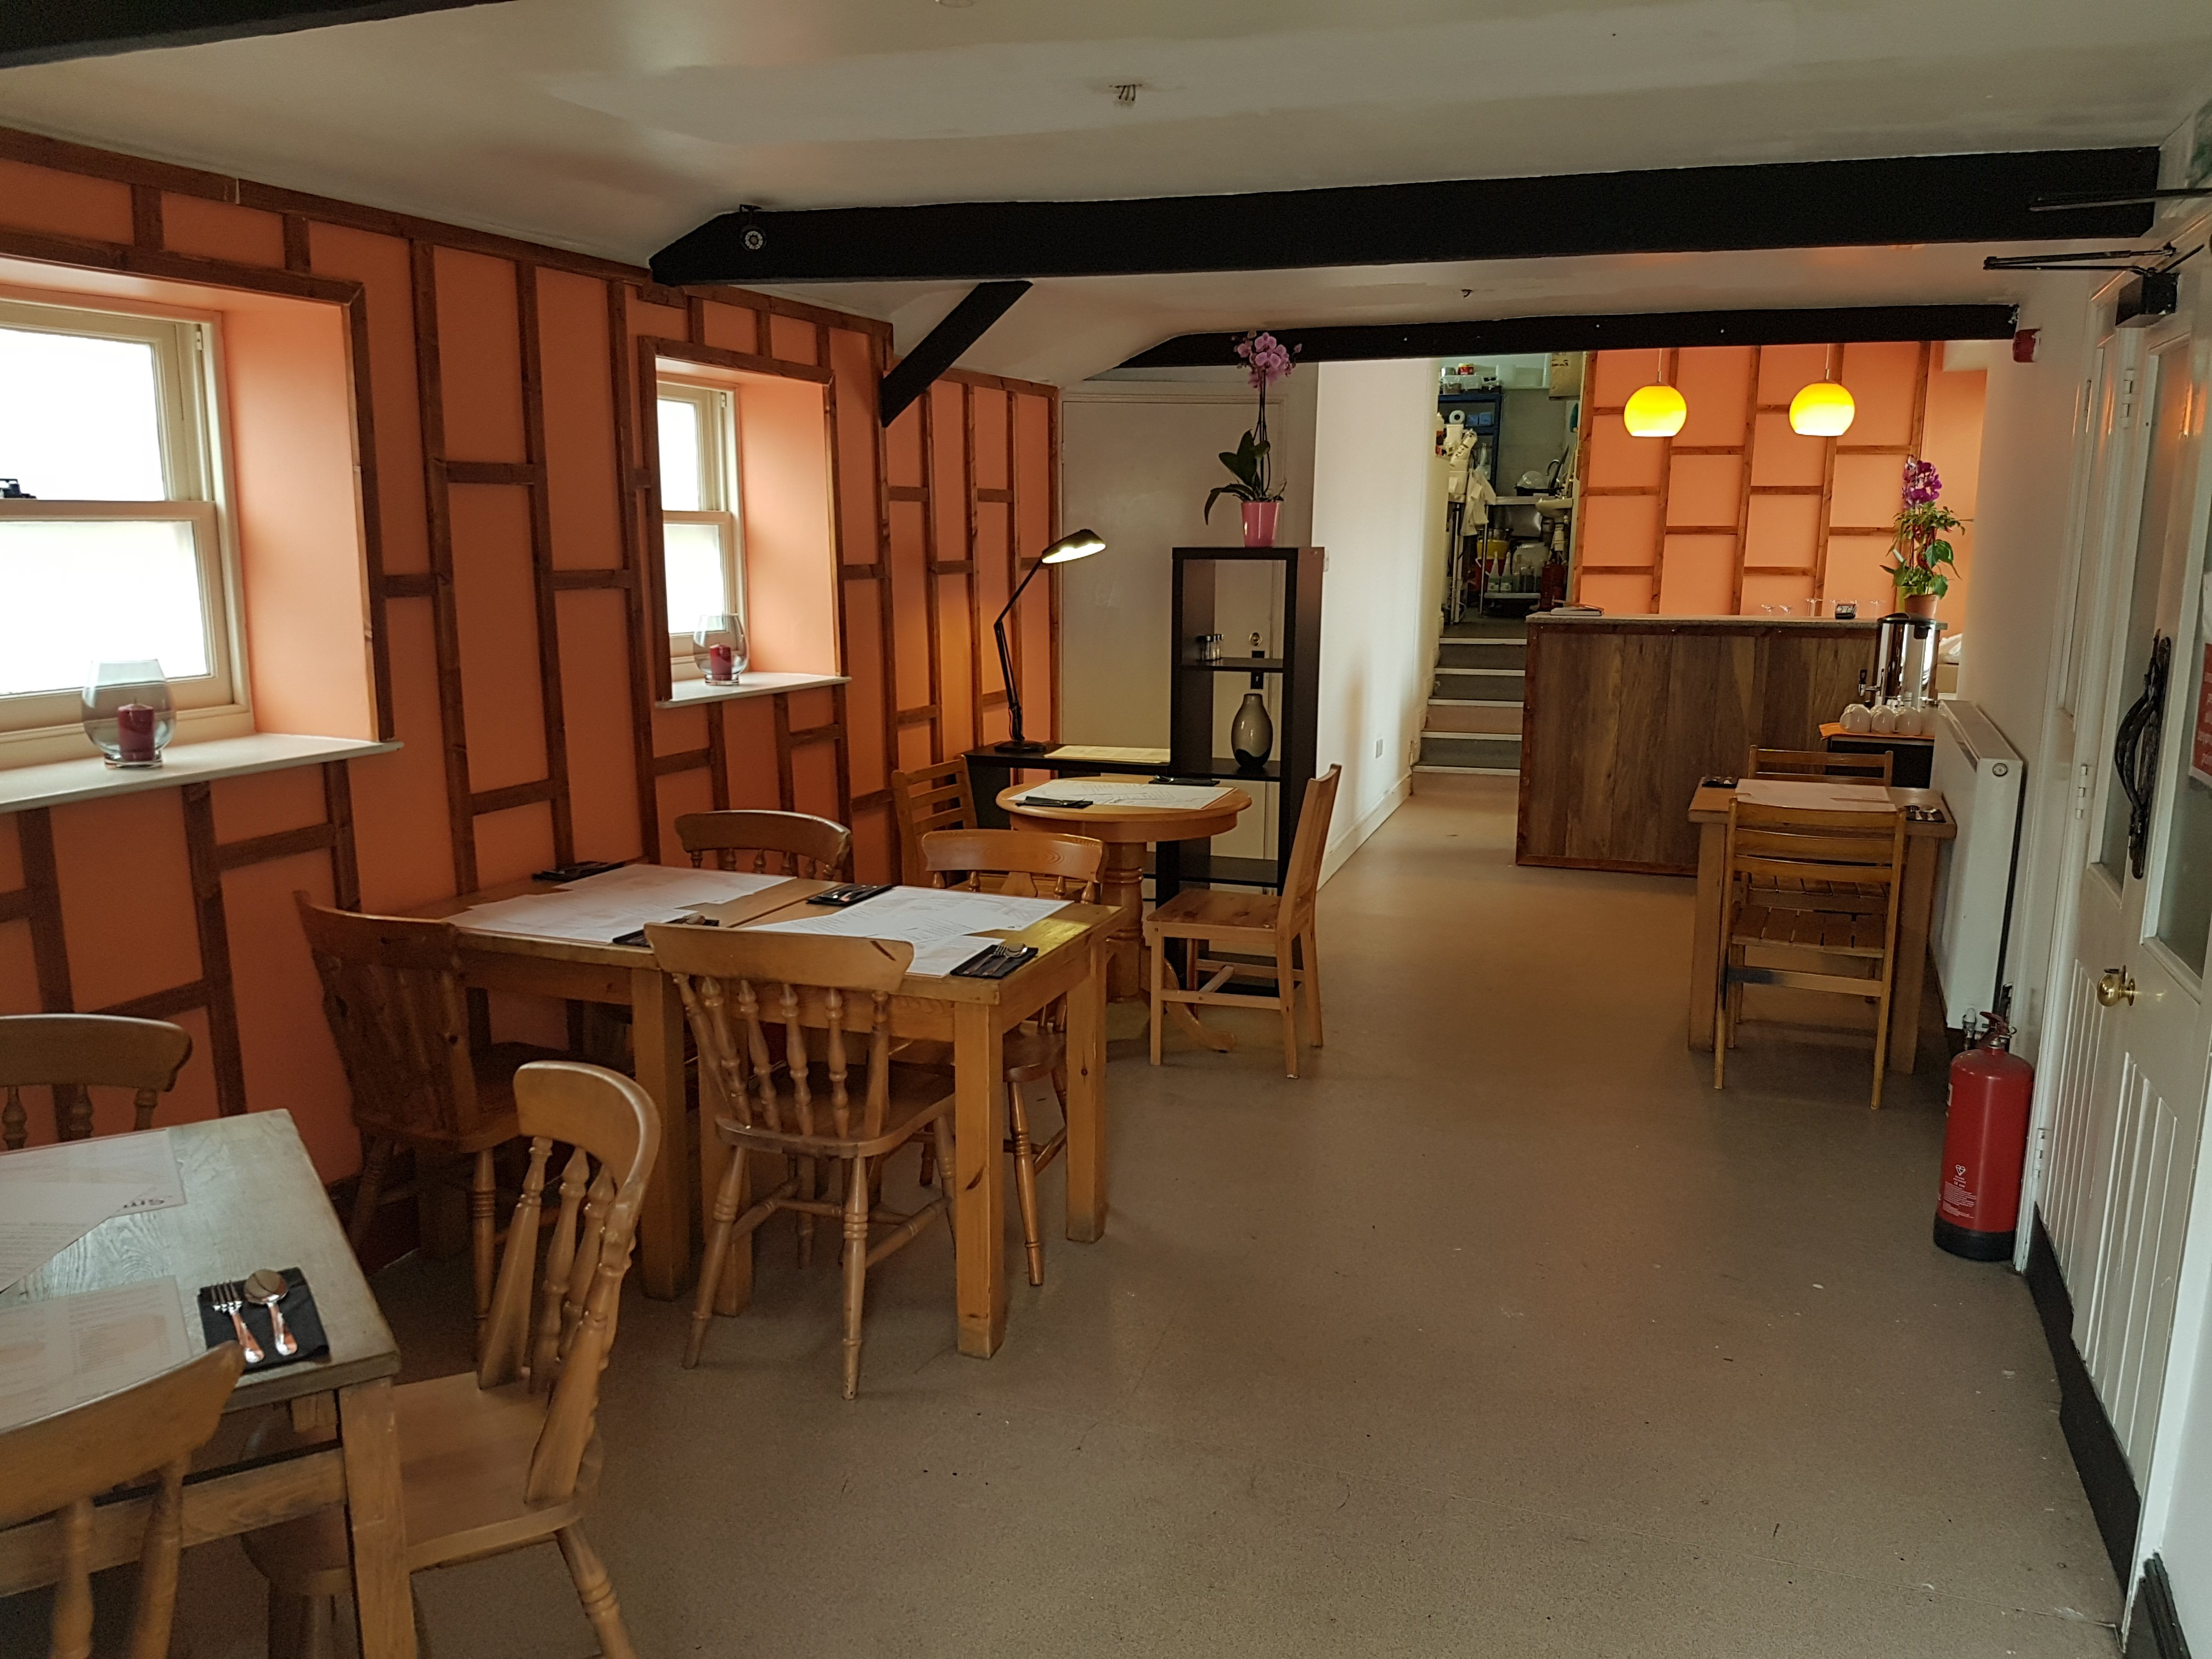 Smile Thai Cafe & Takeaway, Swindon